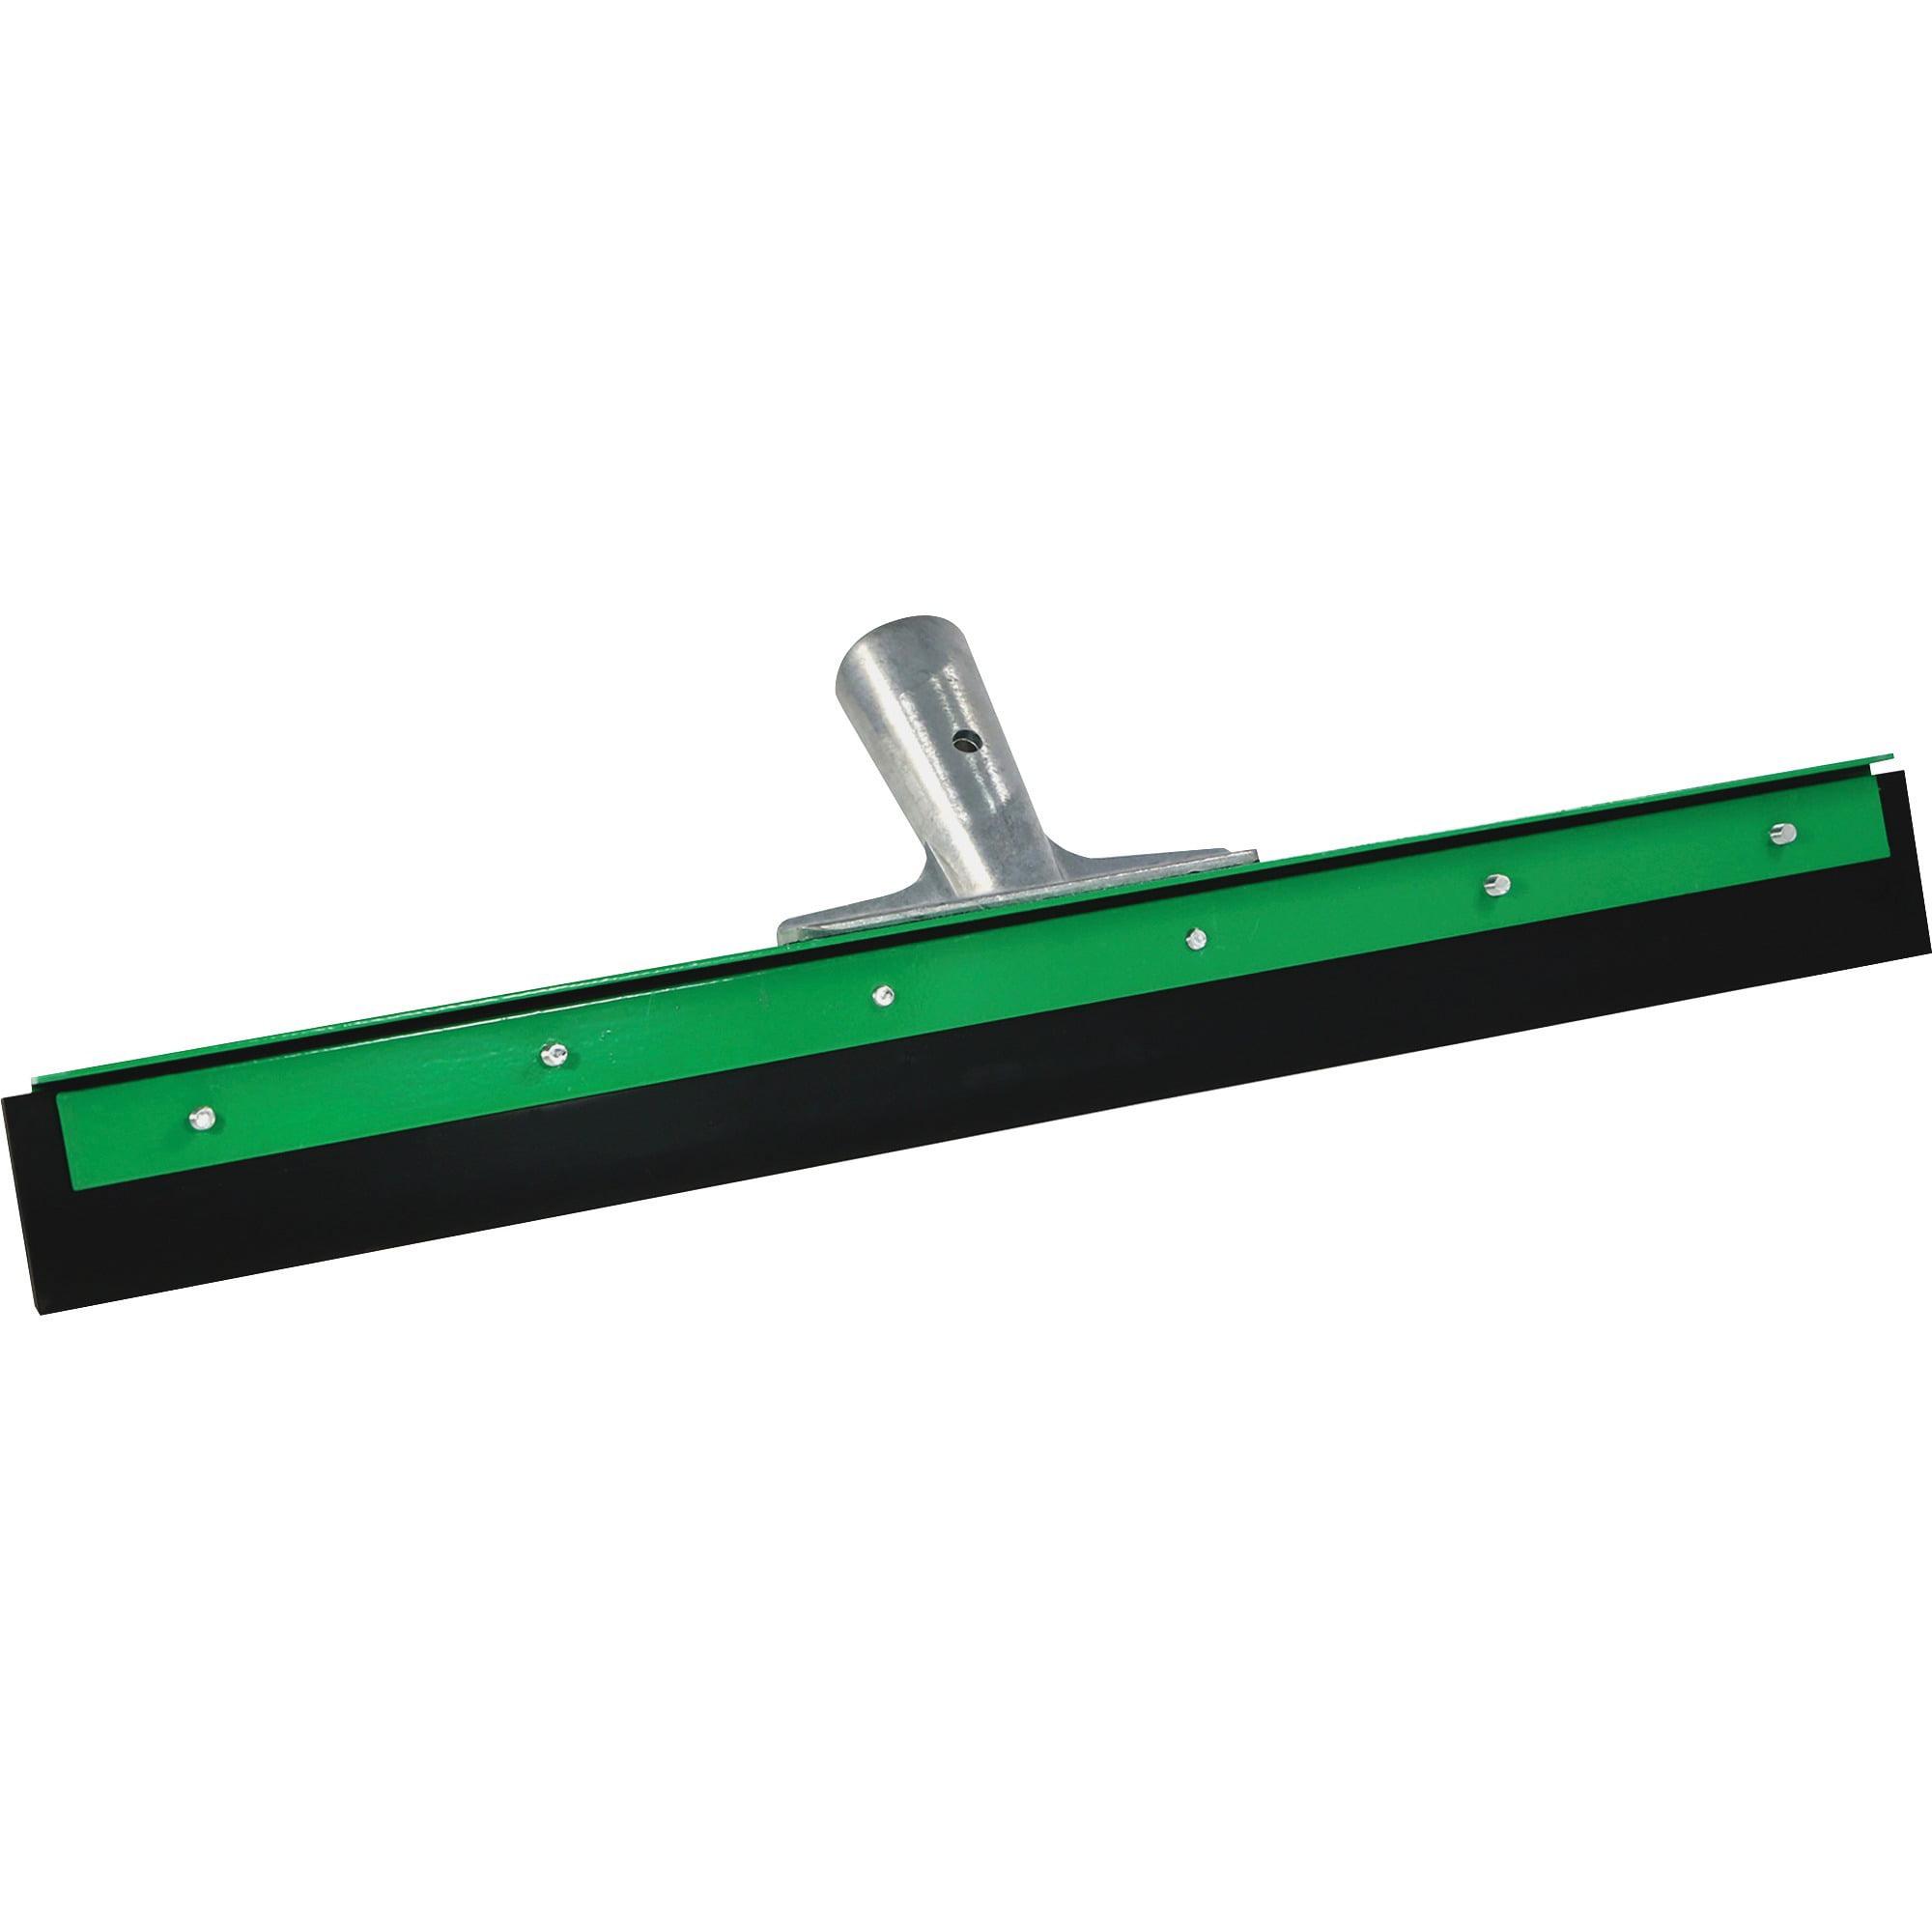 36-Inch Ettore 54036 Straight Steel Floor Squeegee